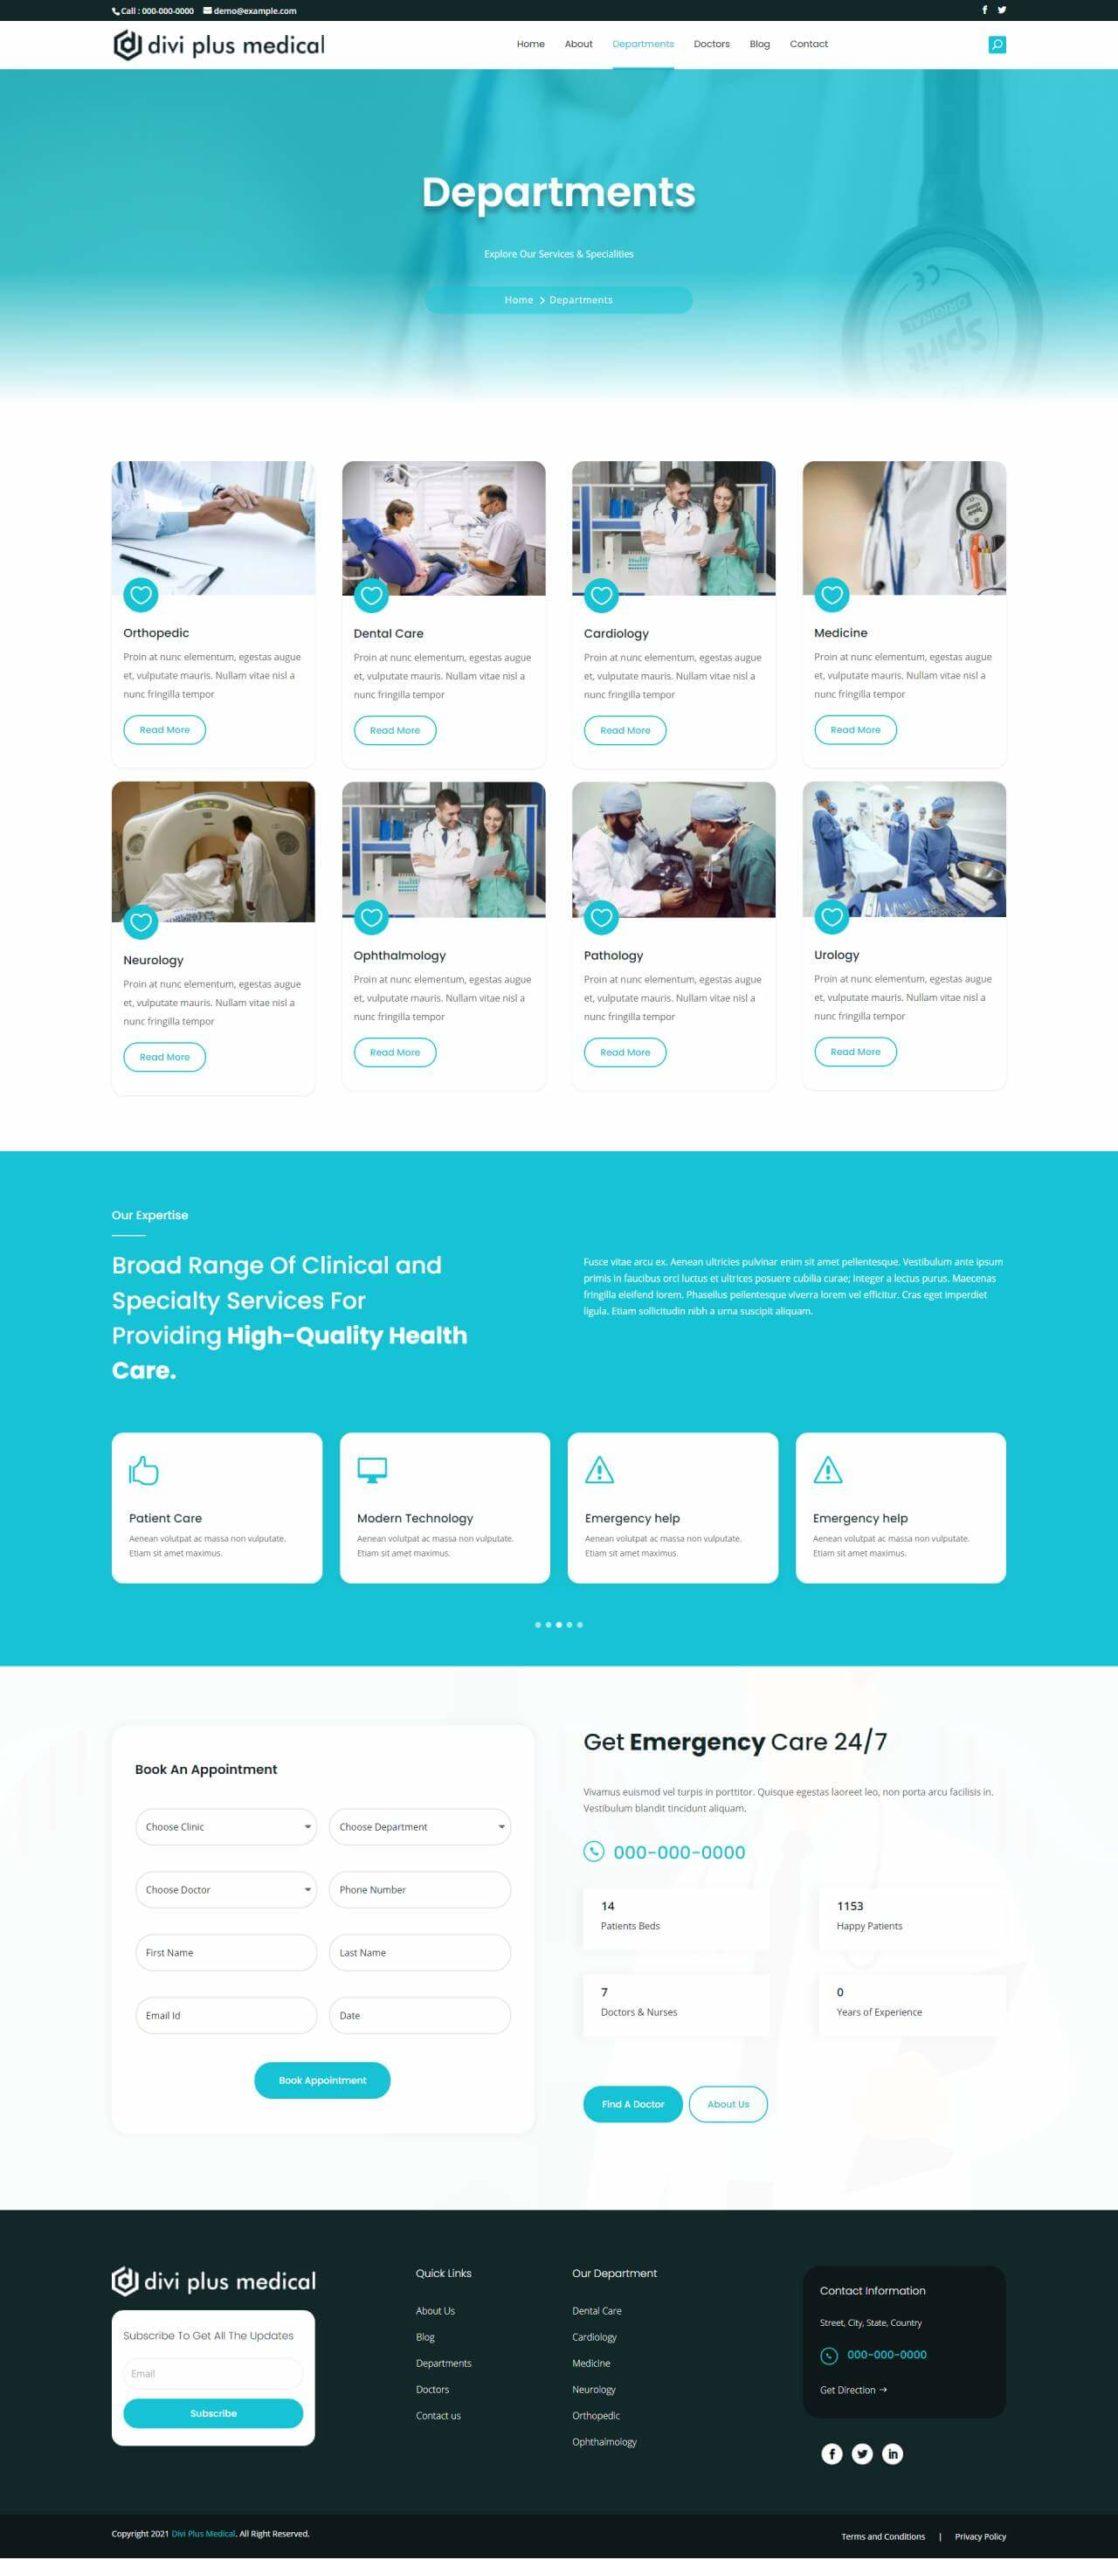 Divi Plus Medical Child Theme Departments